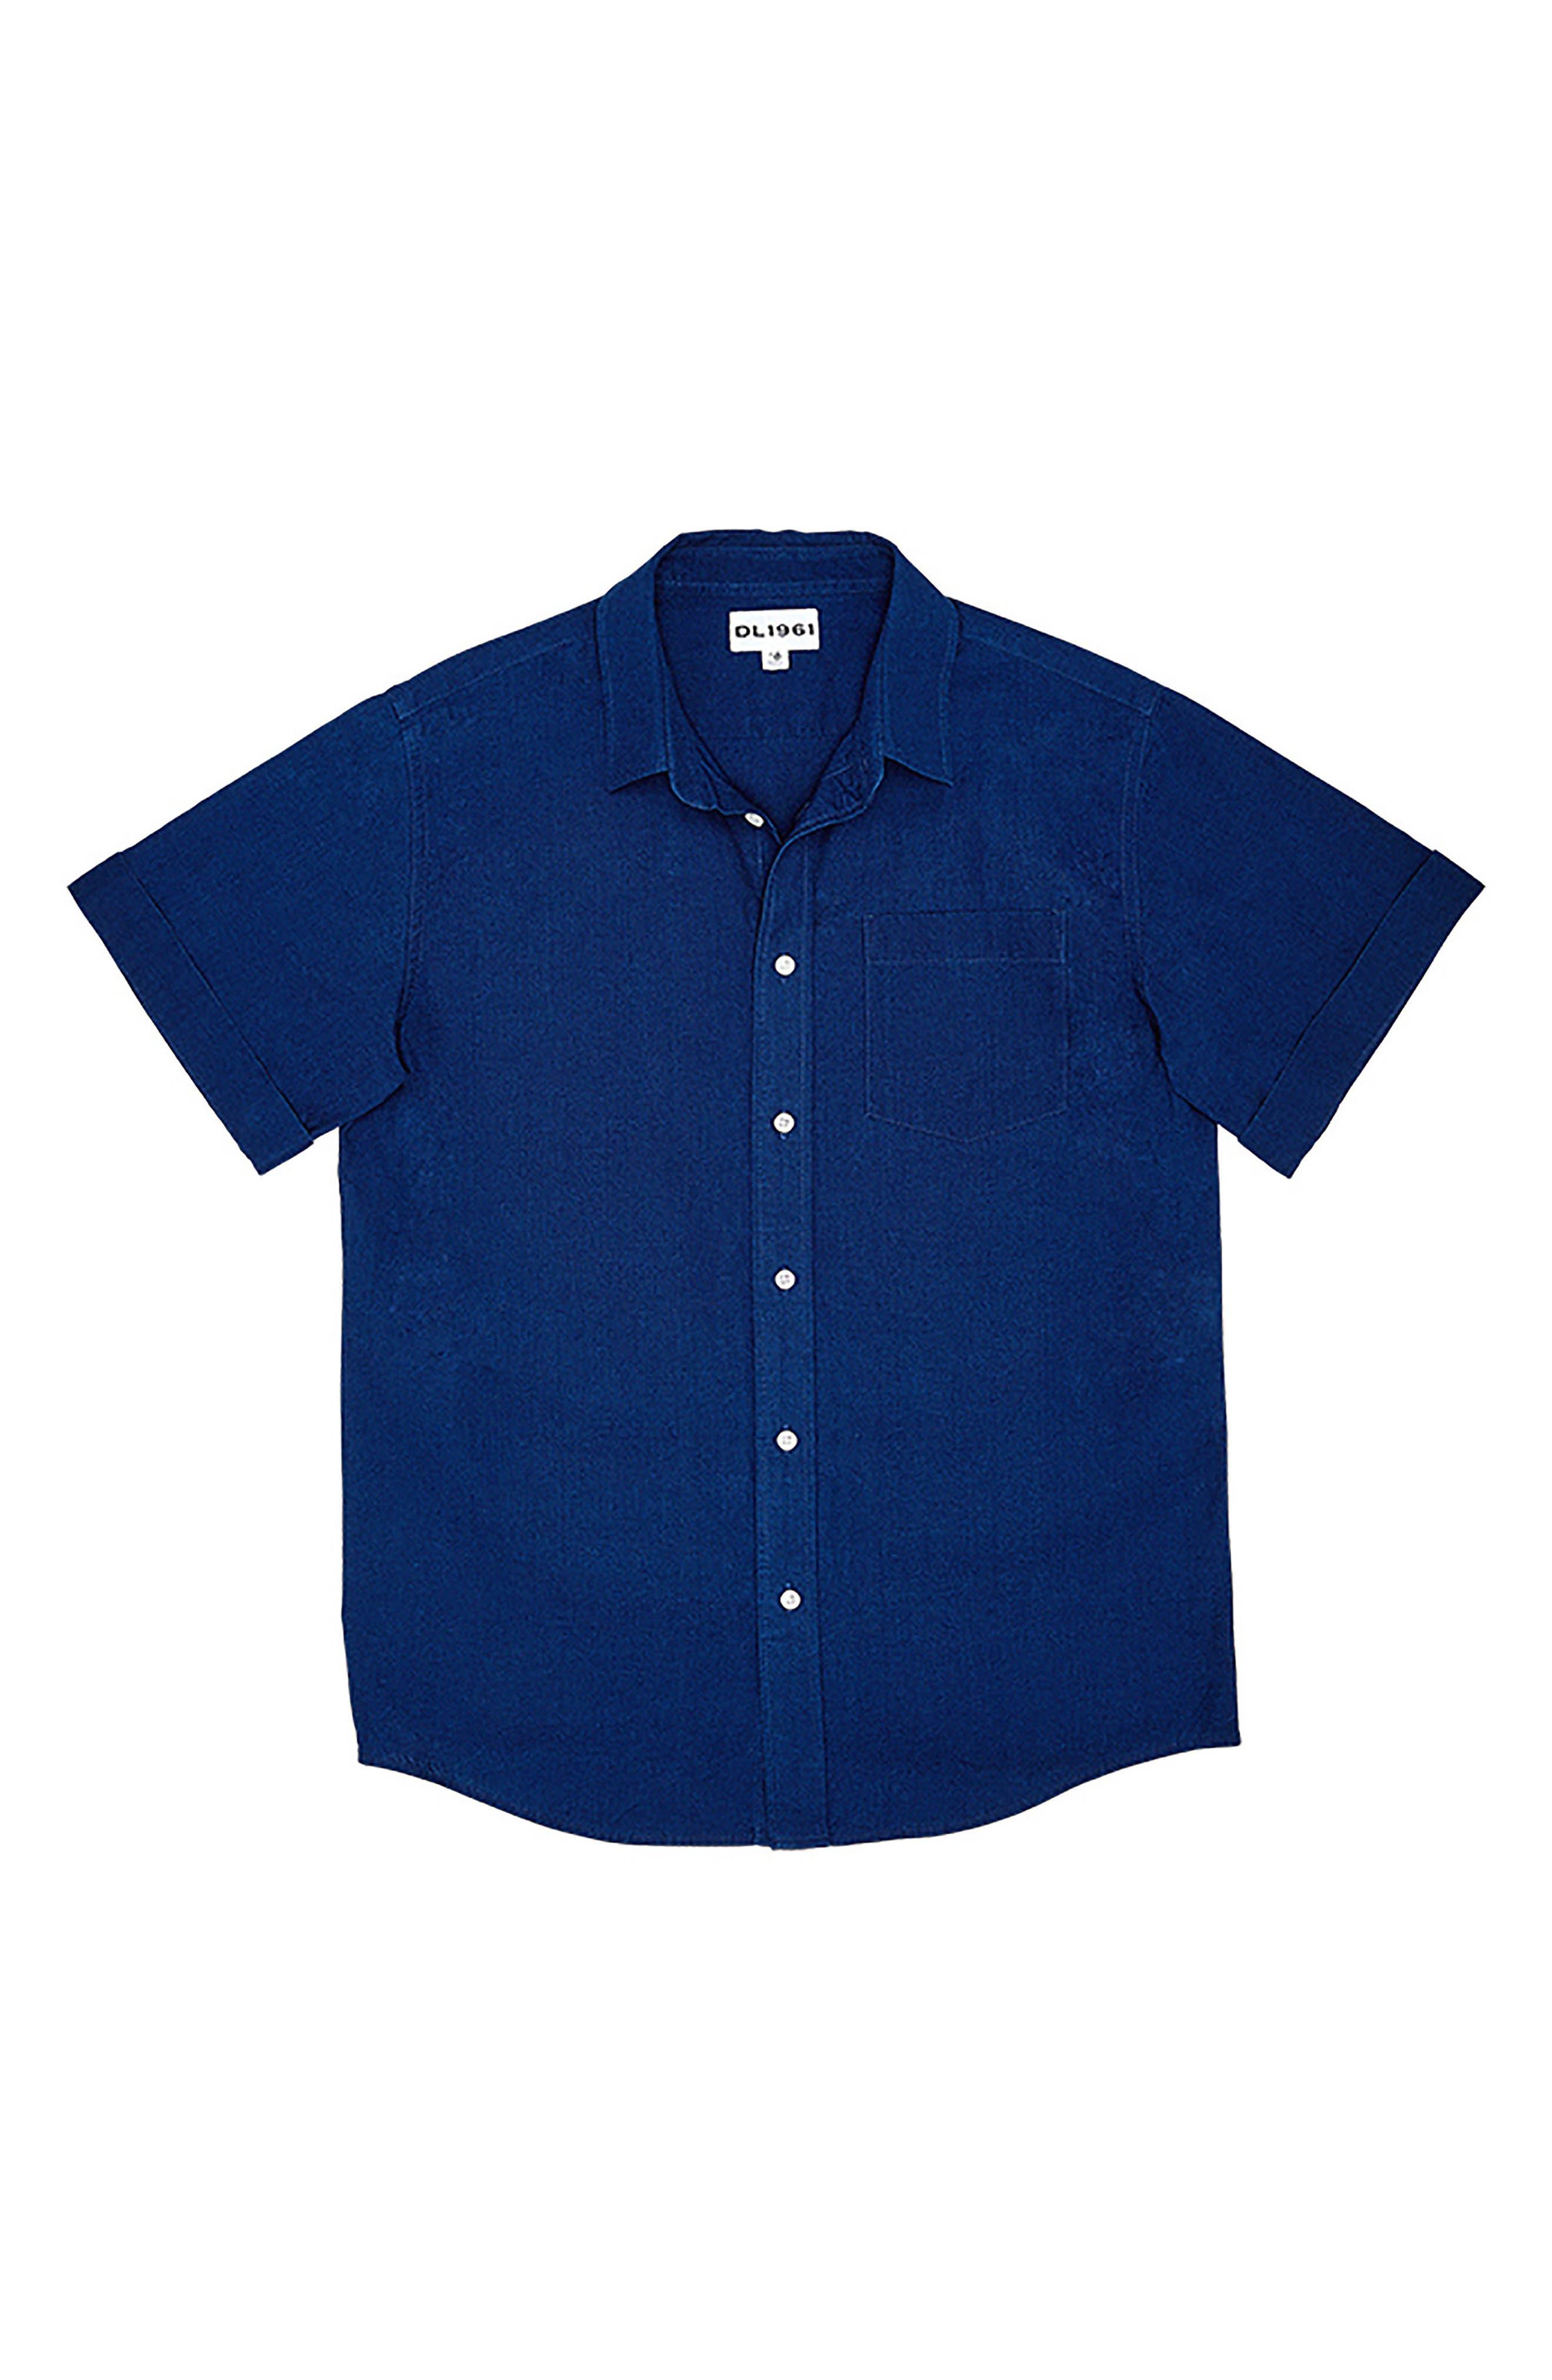 DL 1961 Ash Woven Shirt (Big Boys)